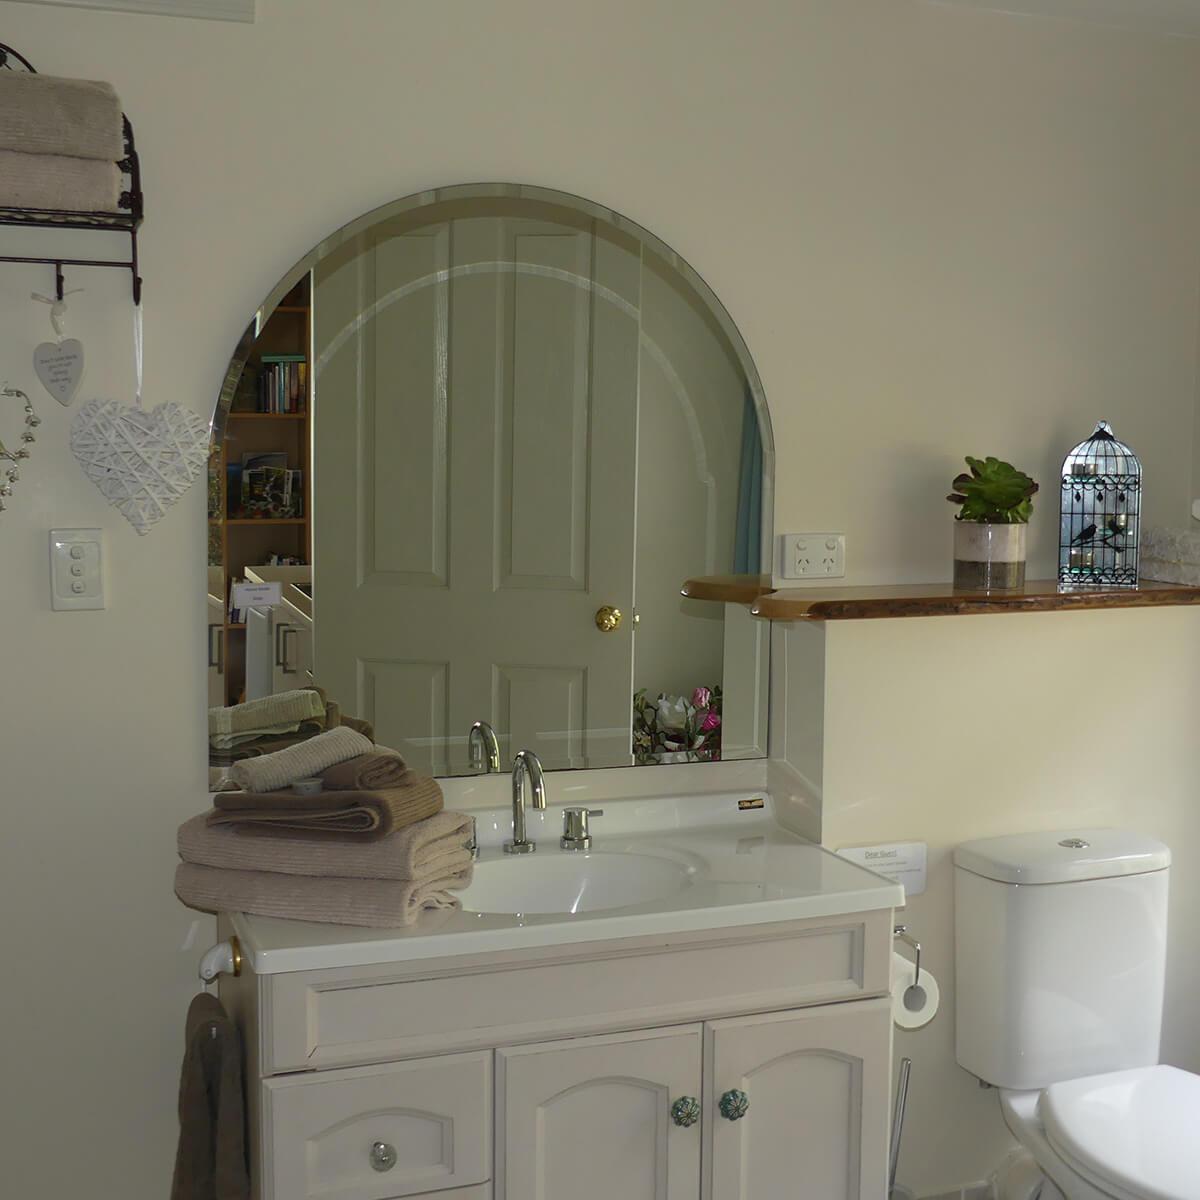 cedar-room-bathroom